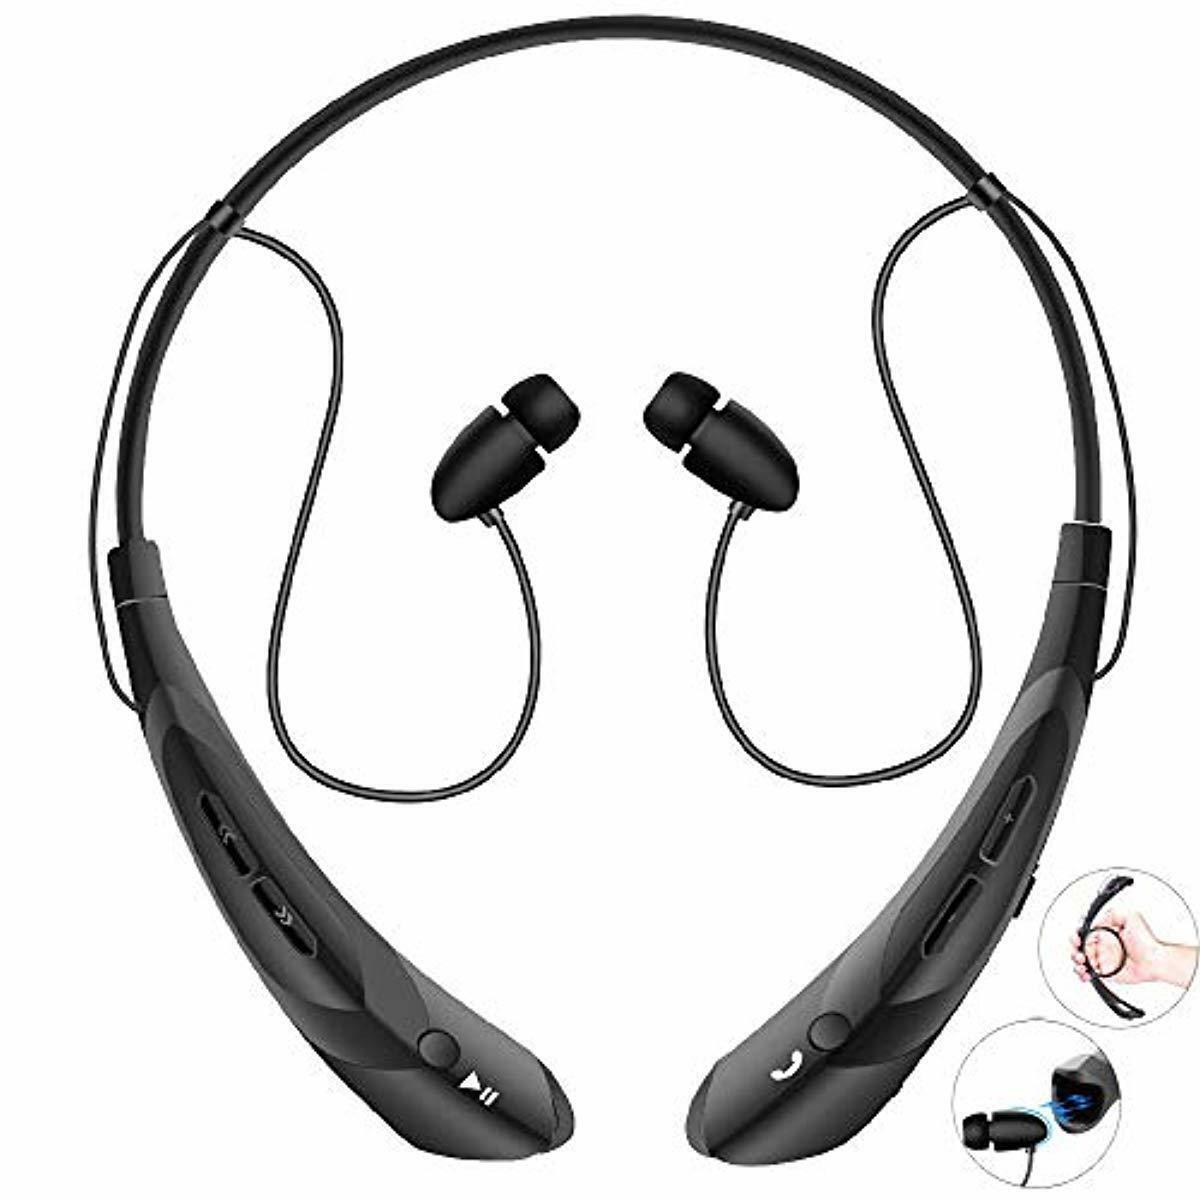 Auricular Bluetooth Auriculares Auriculares Inalambrico Deportivos Estereo Para Iphone Samsung Lg Ebay